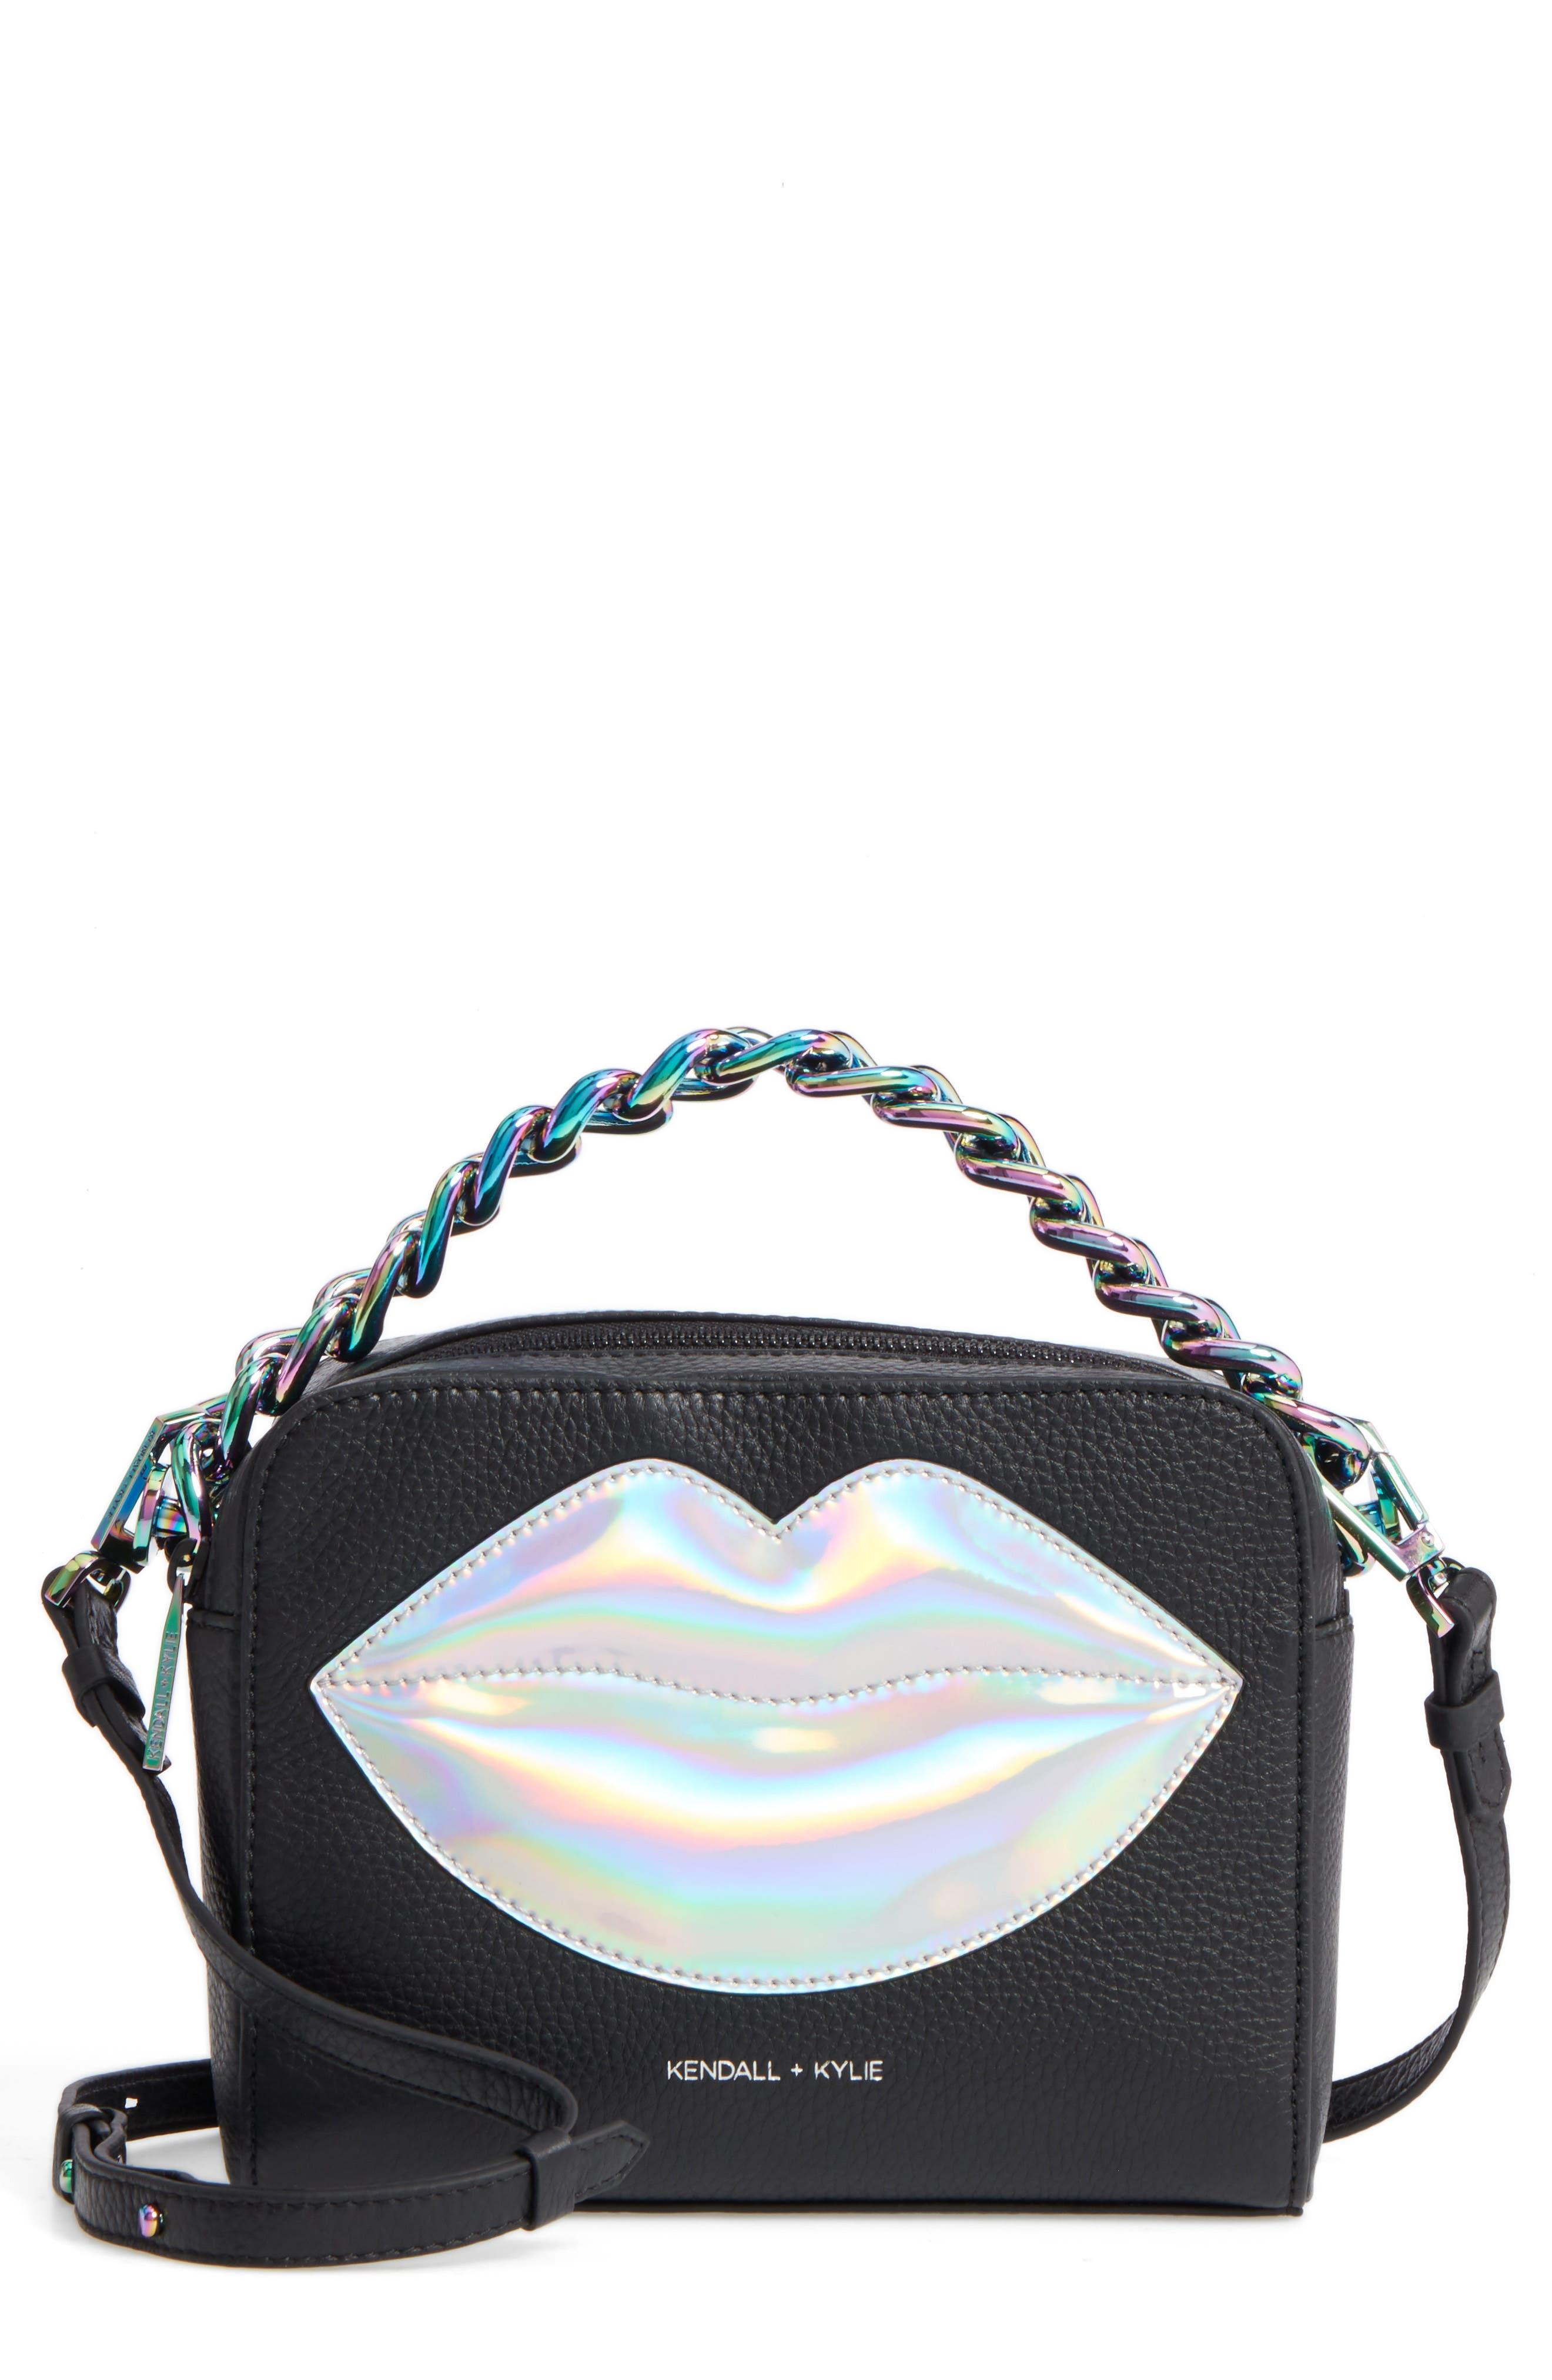 Lucy Lips Crossbody Bag,                             Main thumbnail 1, color,                             Black